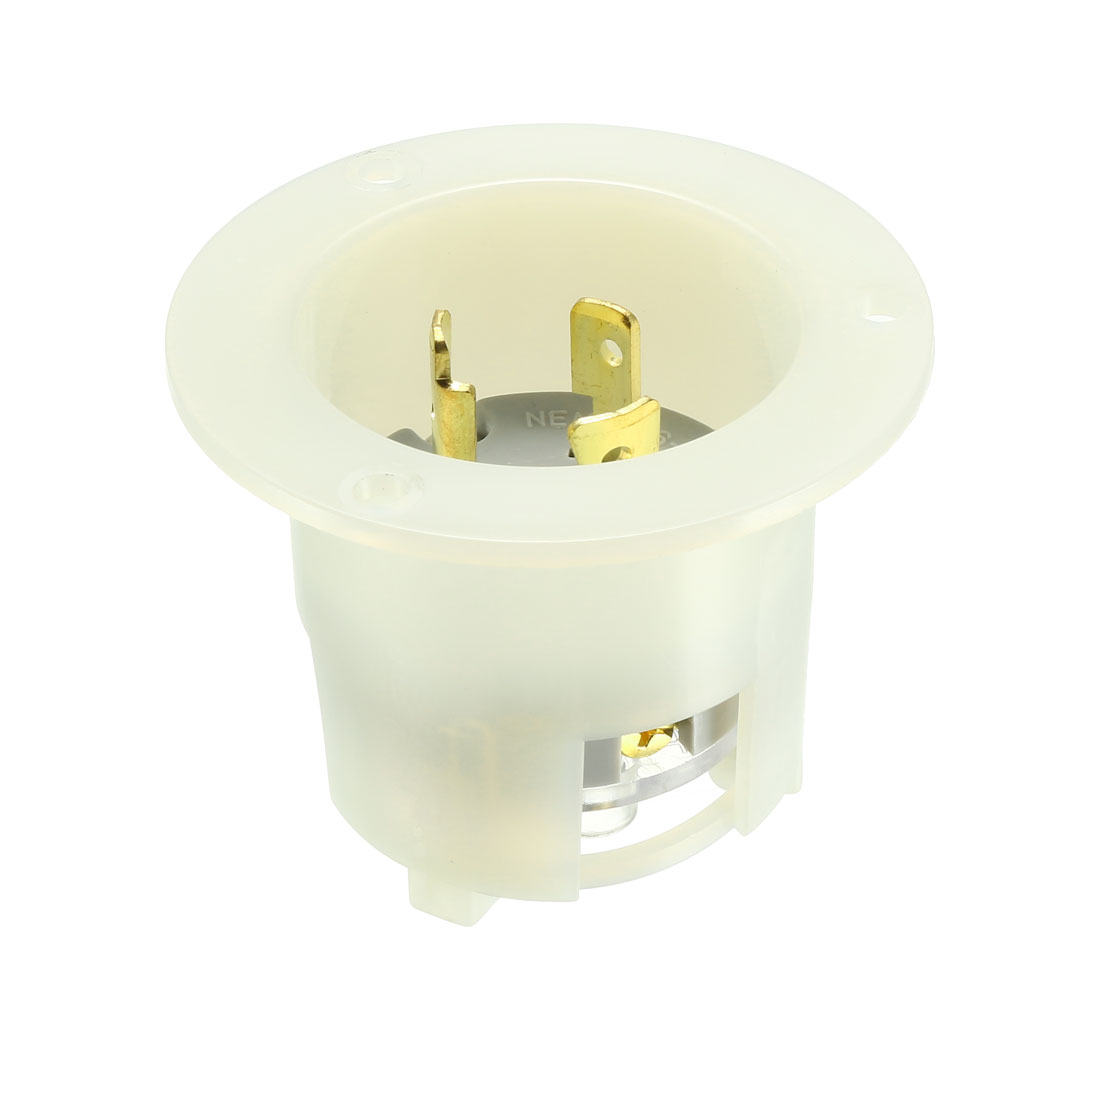 Flanged Power Inlet Twist Lock NEMA L6-20P, 20A 250VAC, 2 Pole 3 Wire